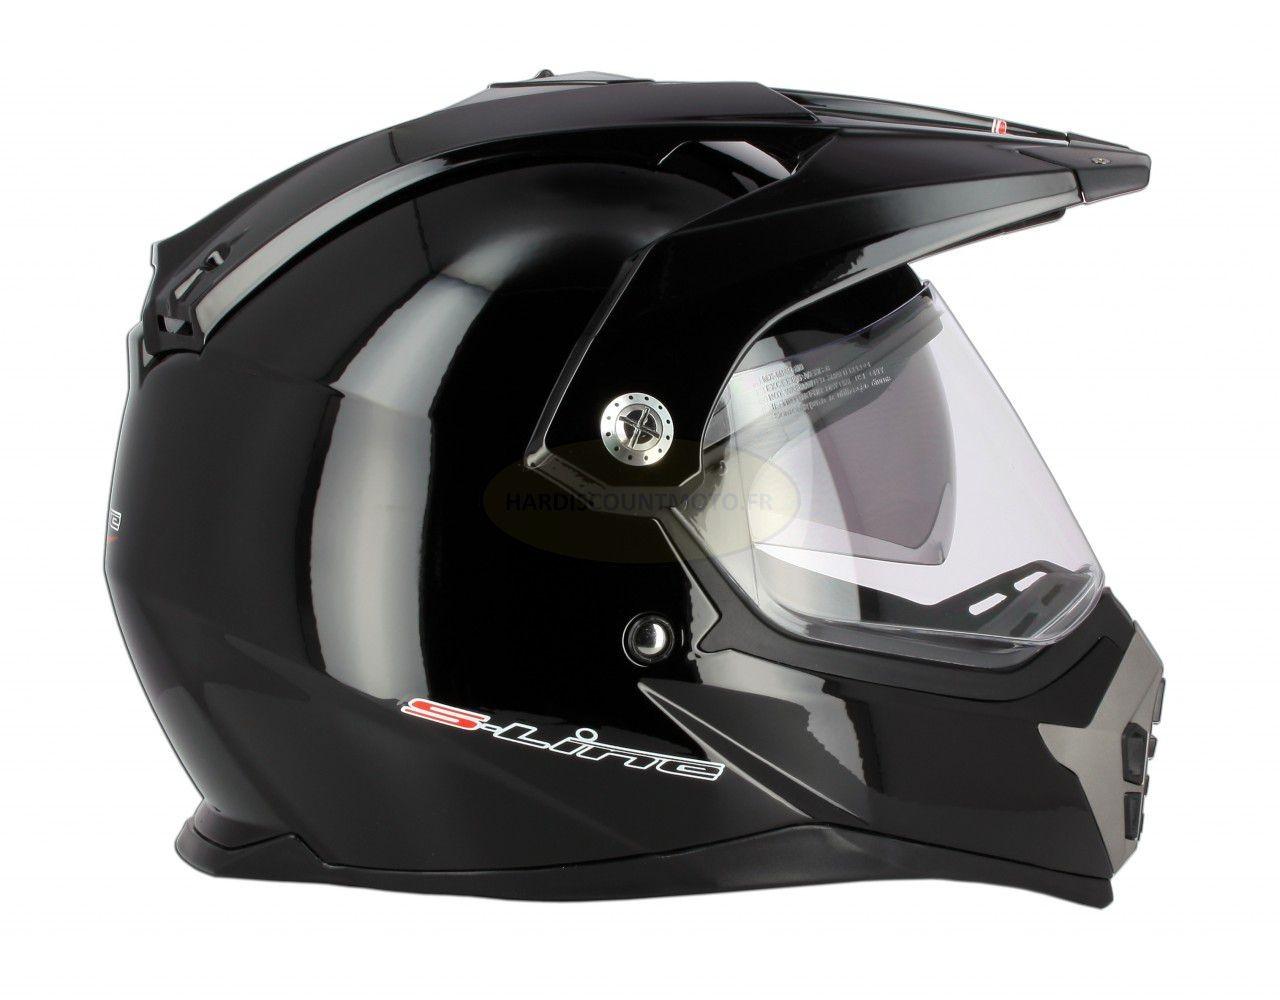 Casque Moto Enduro Air Pump S610 motobigstore